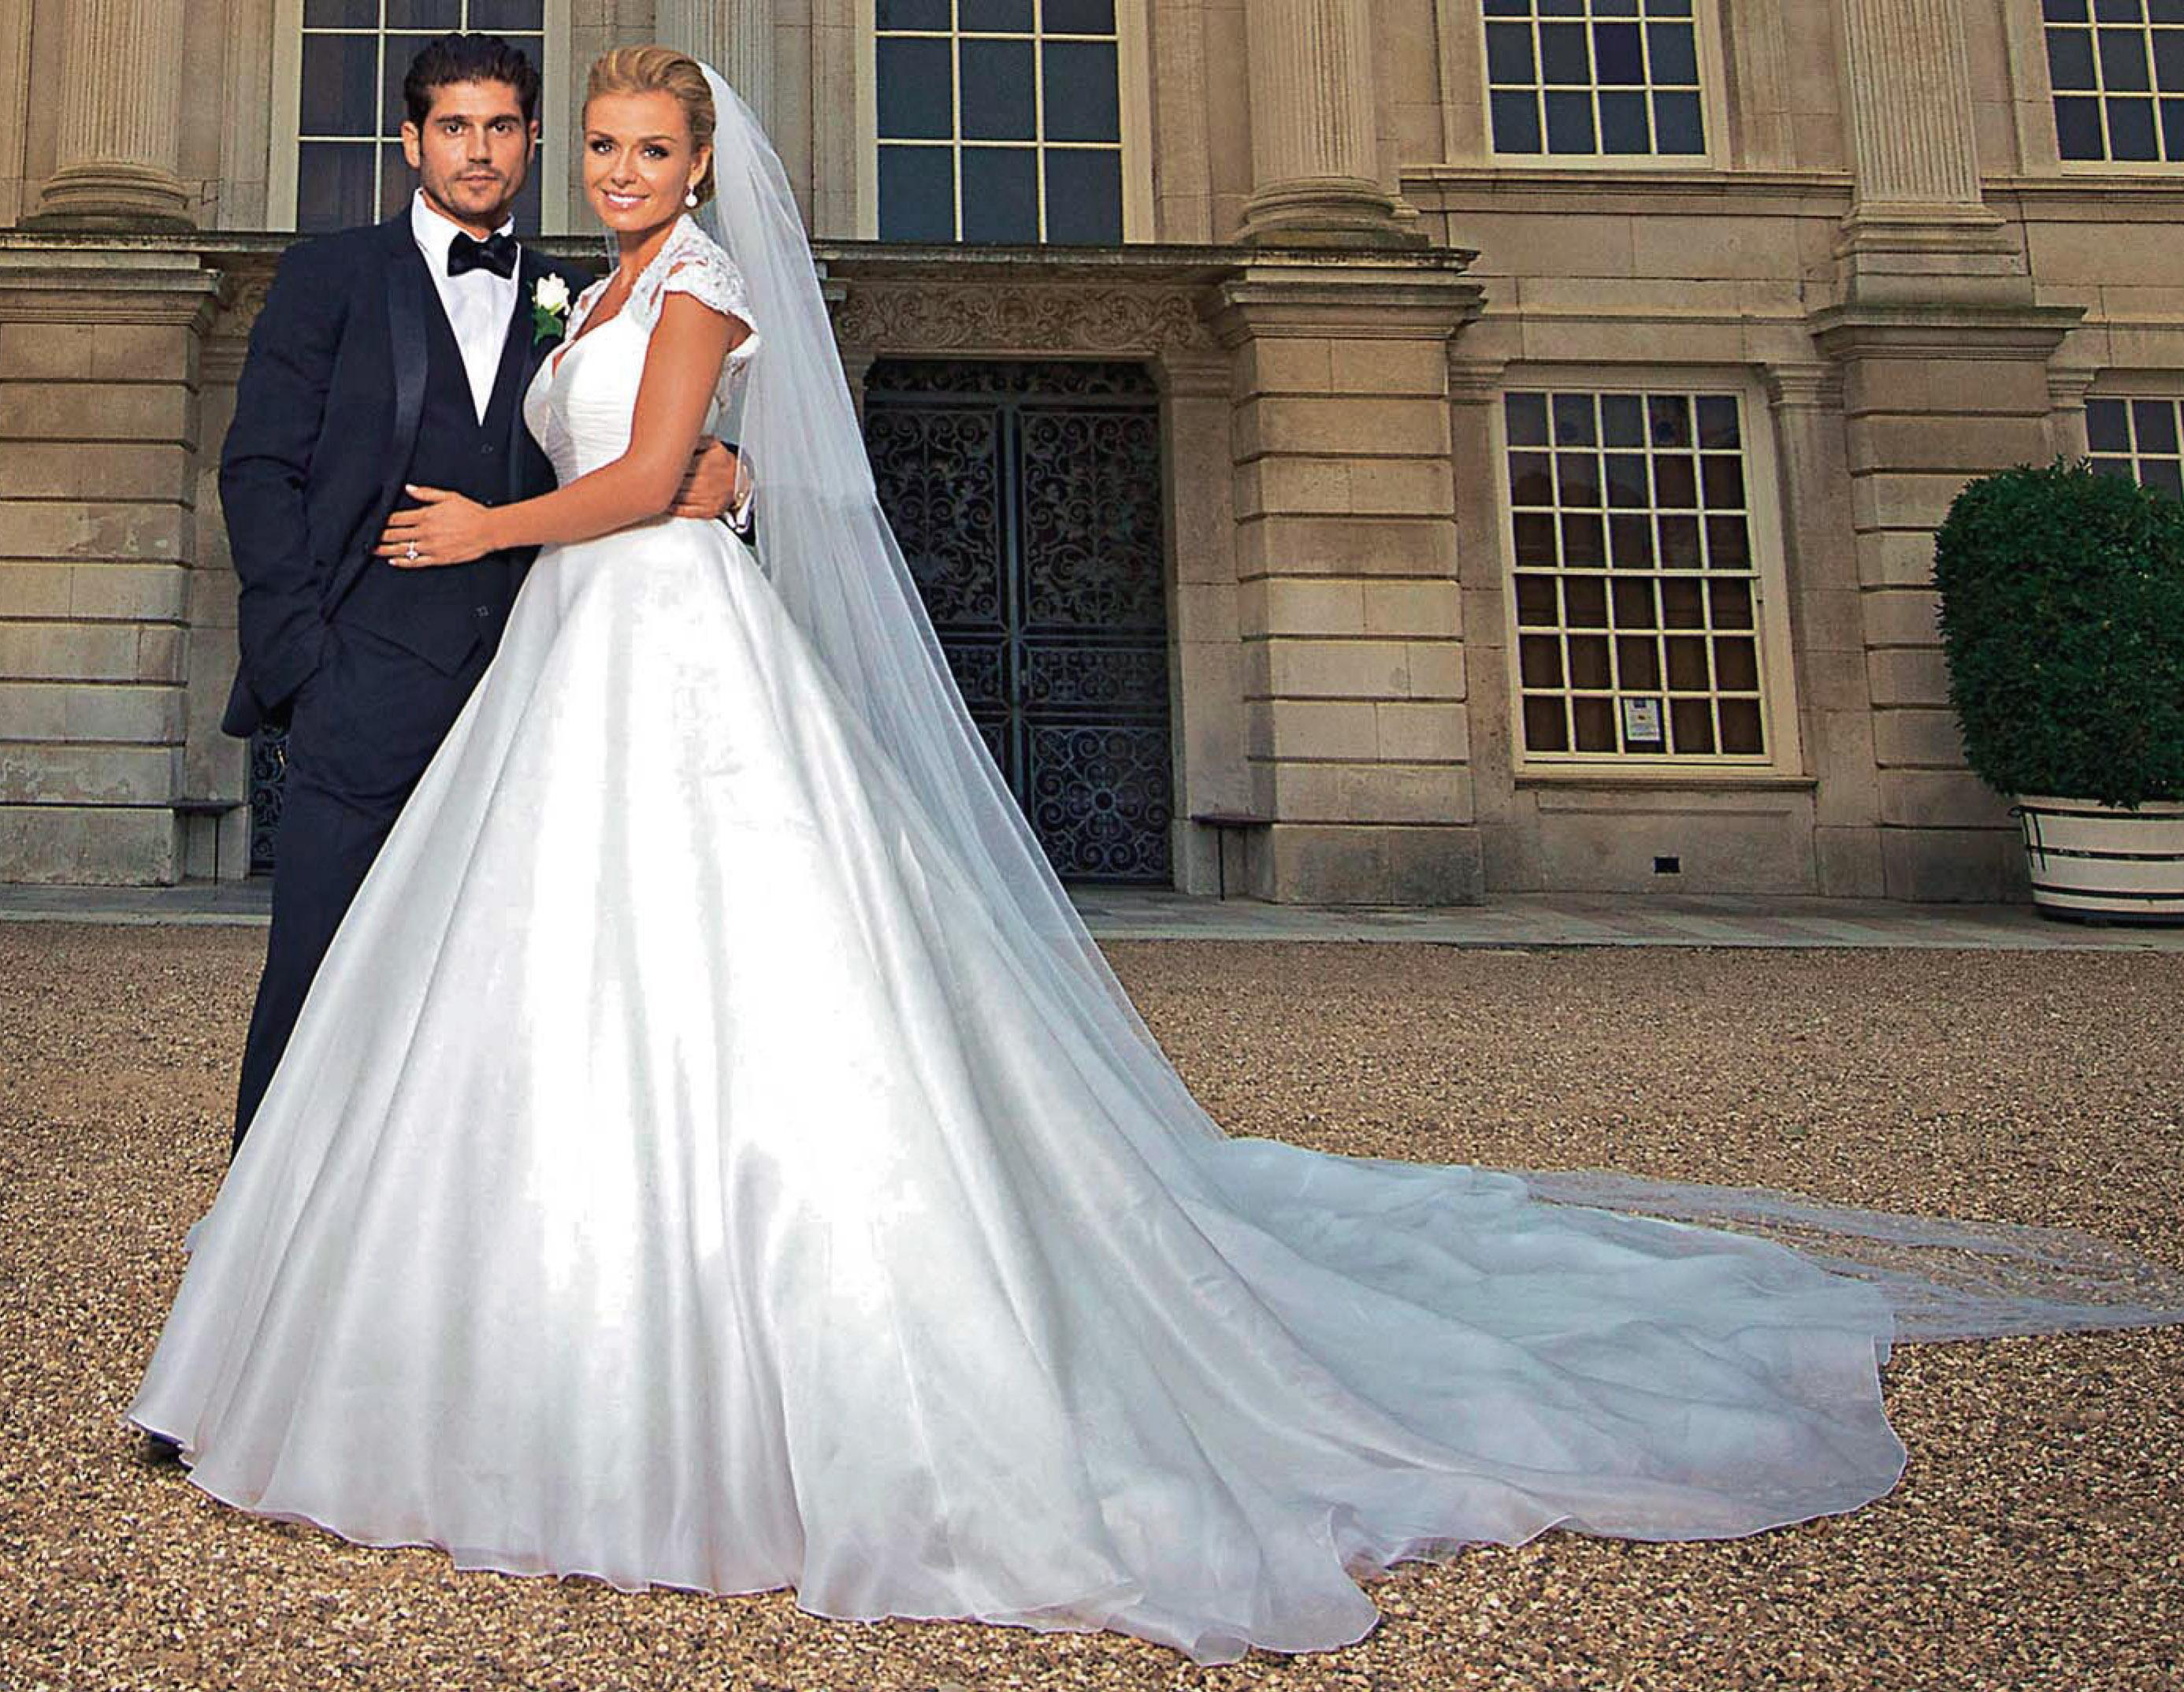 Bridal designer to the stars shares her secrets of her dream dresses